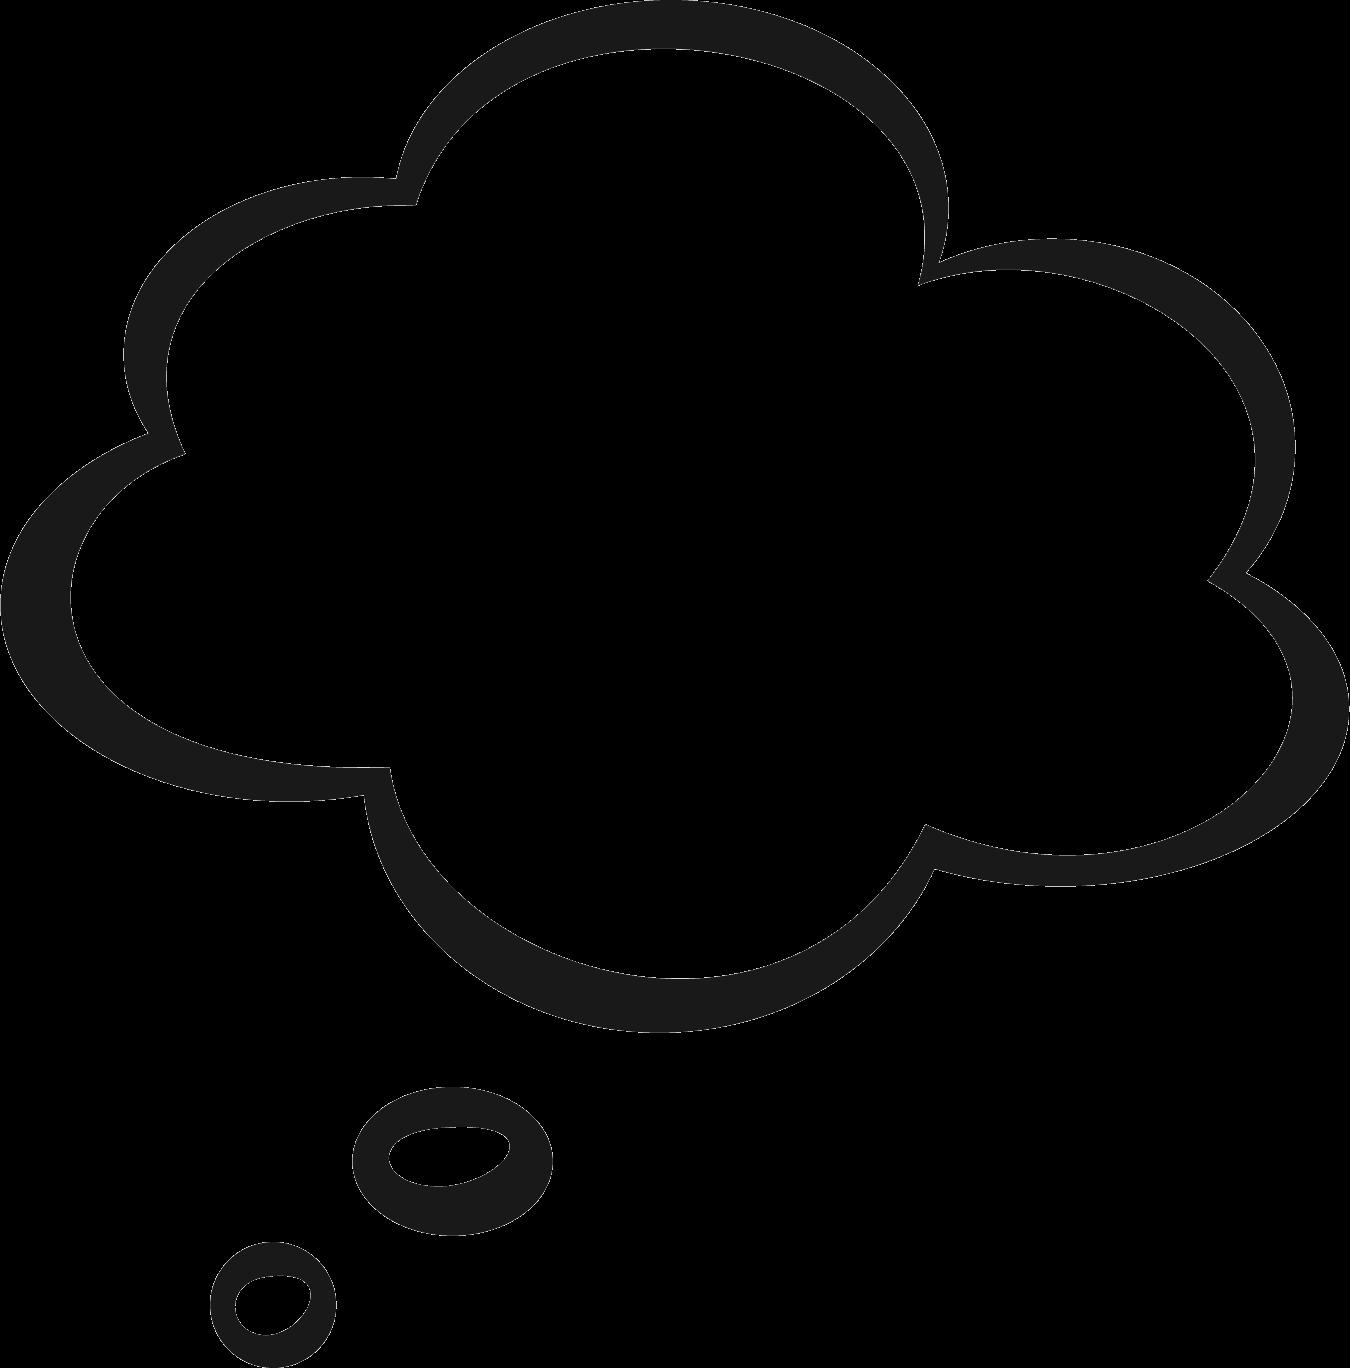 Thought bubble transparent png. Clouds clipart translucent